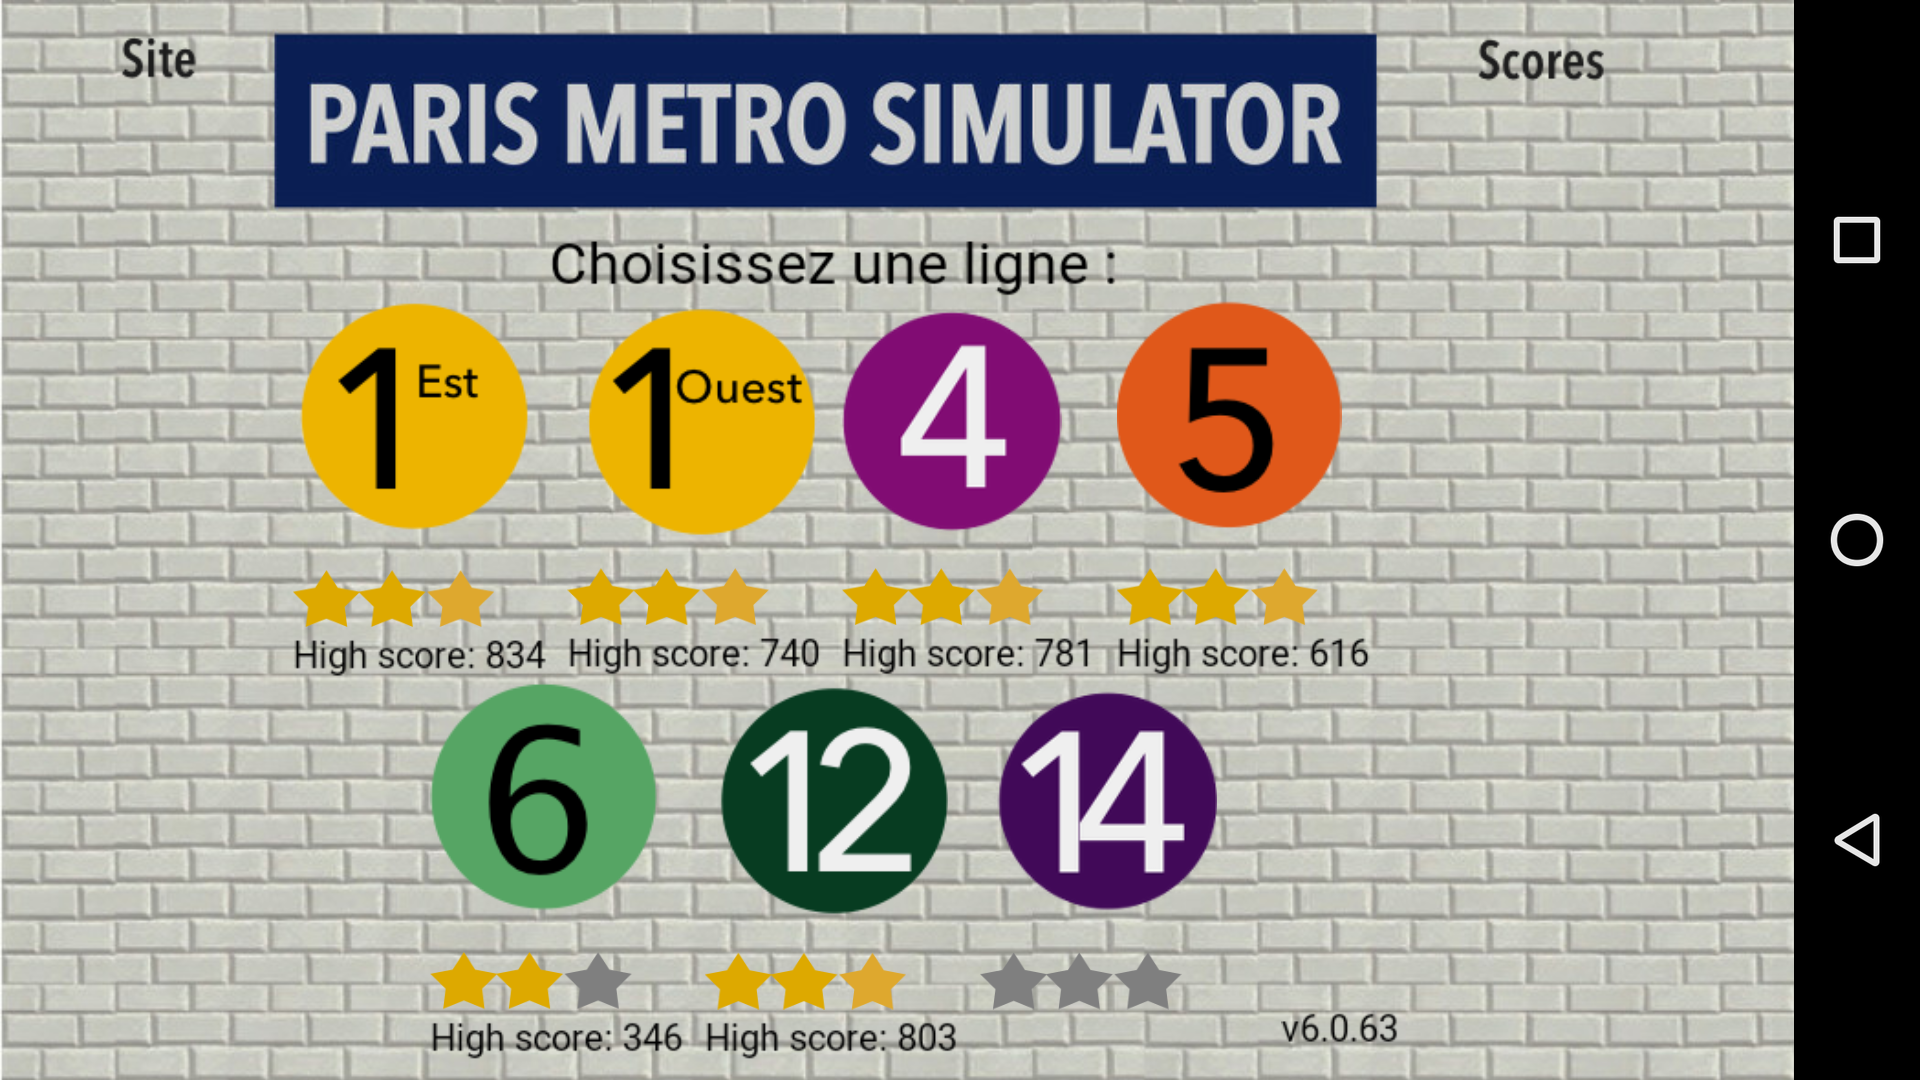 Mantalow: Paris Metro Simulator [Line 4] (Android) 781 points on 2015-12-11 02:09:14